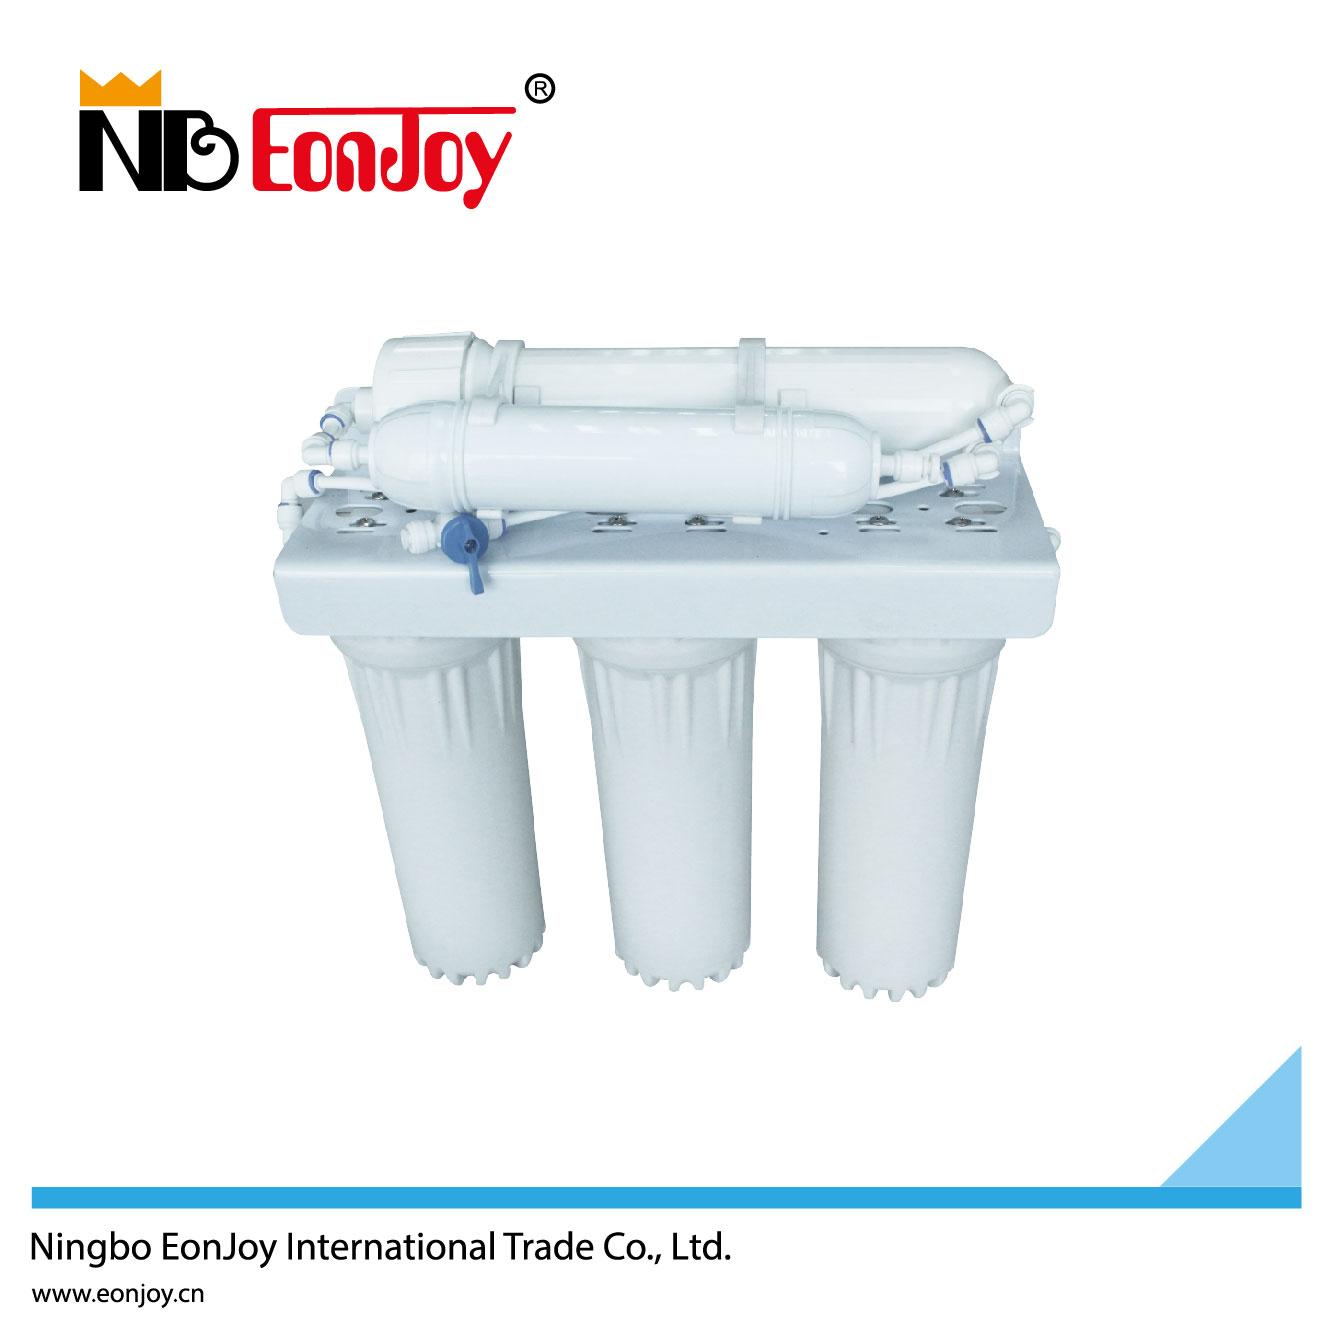 Ningbo Eonjoy International Trade Co., Ltd.